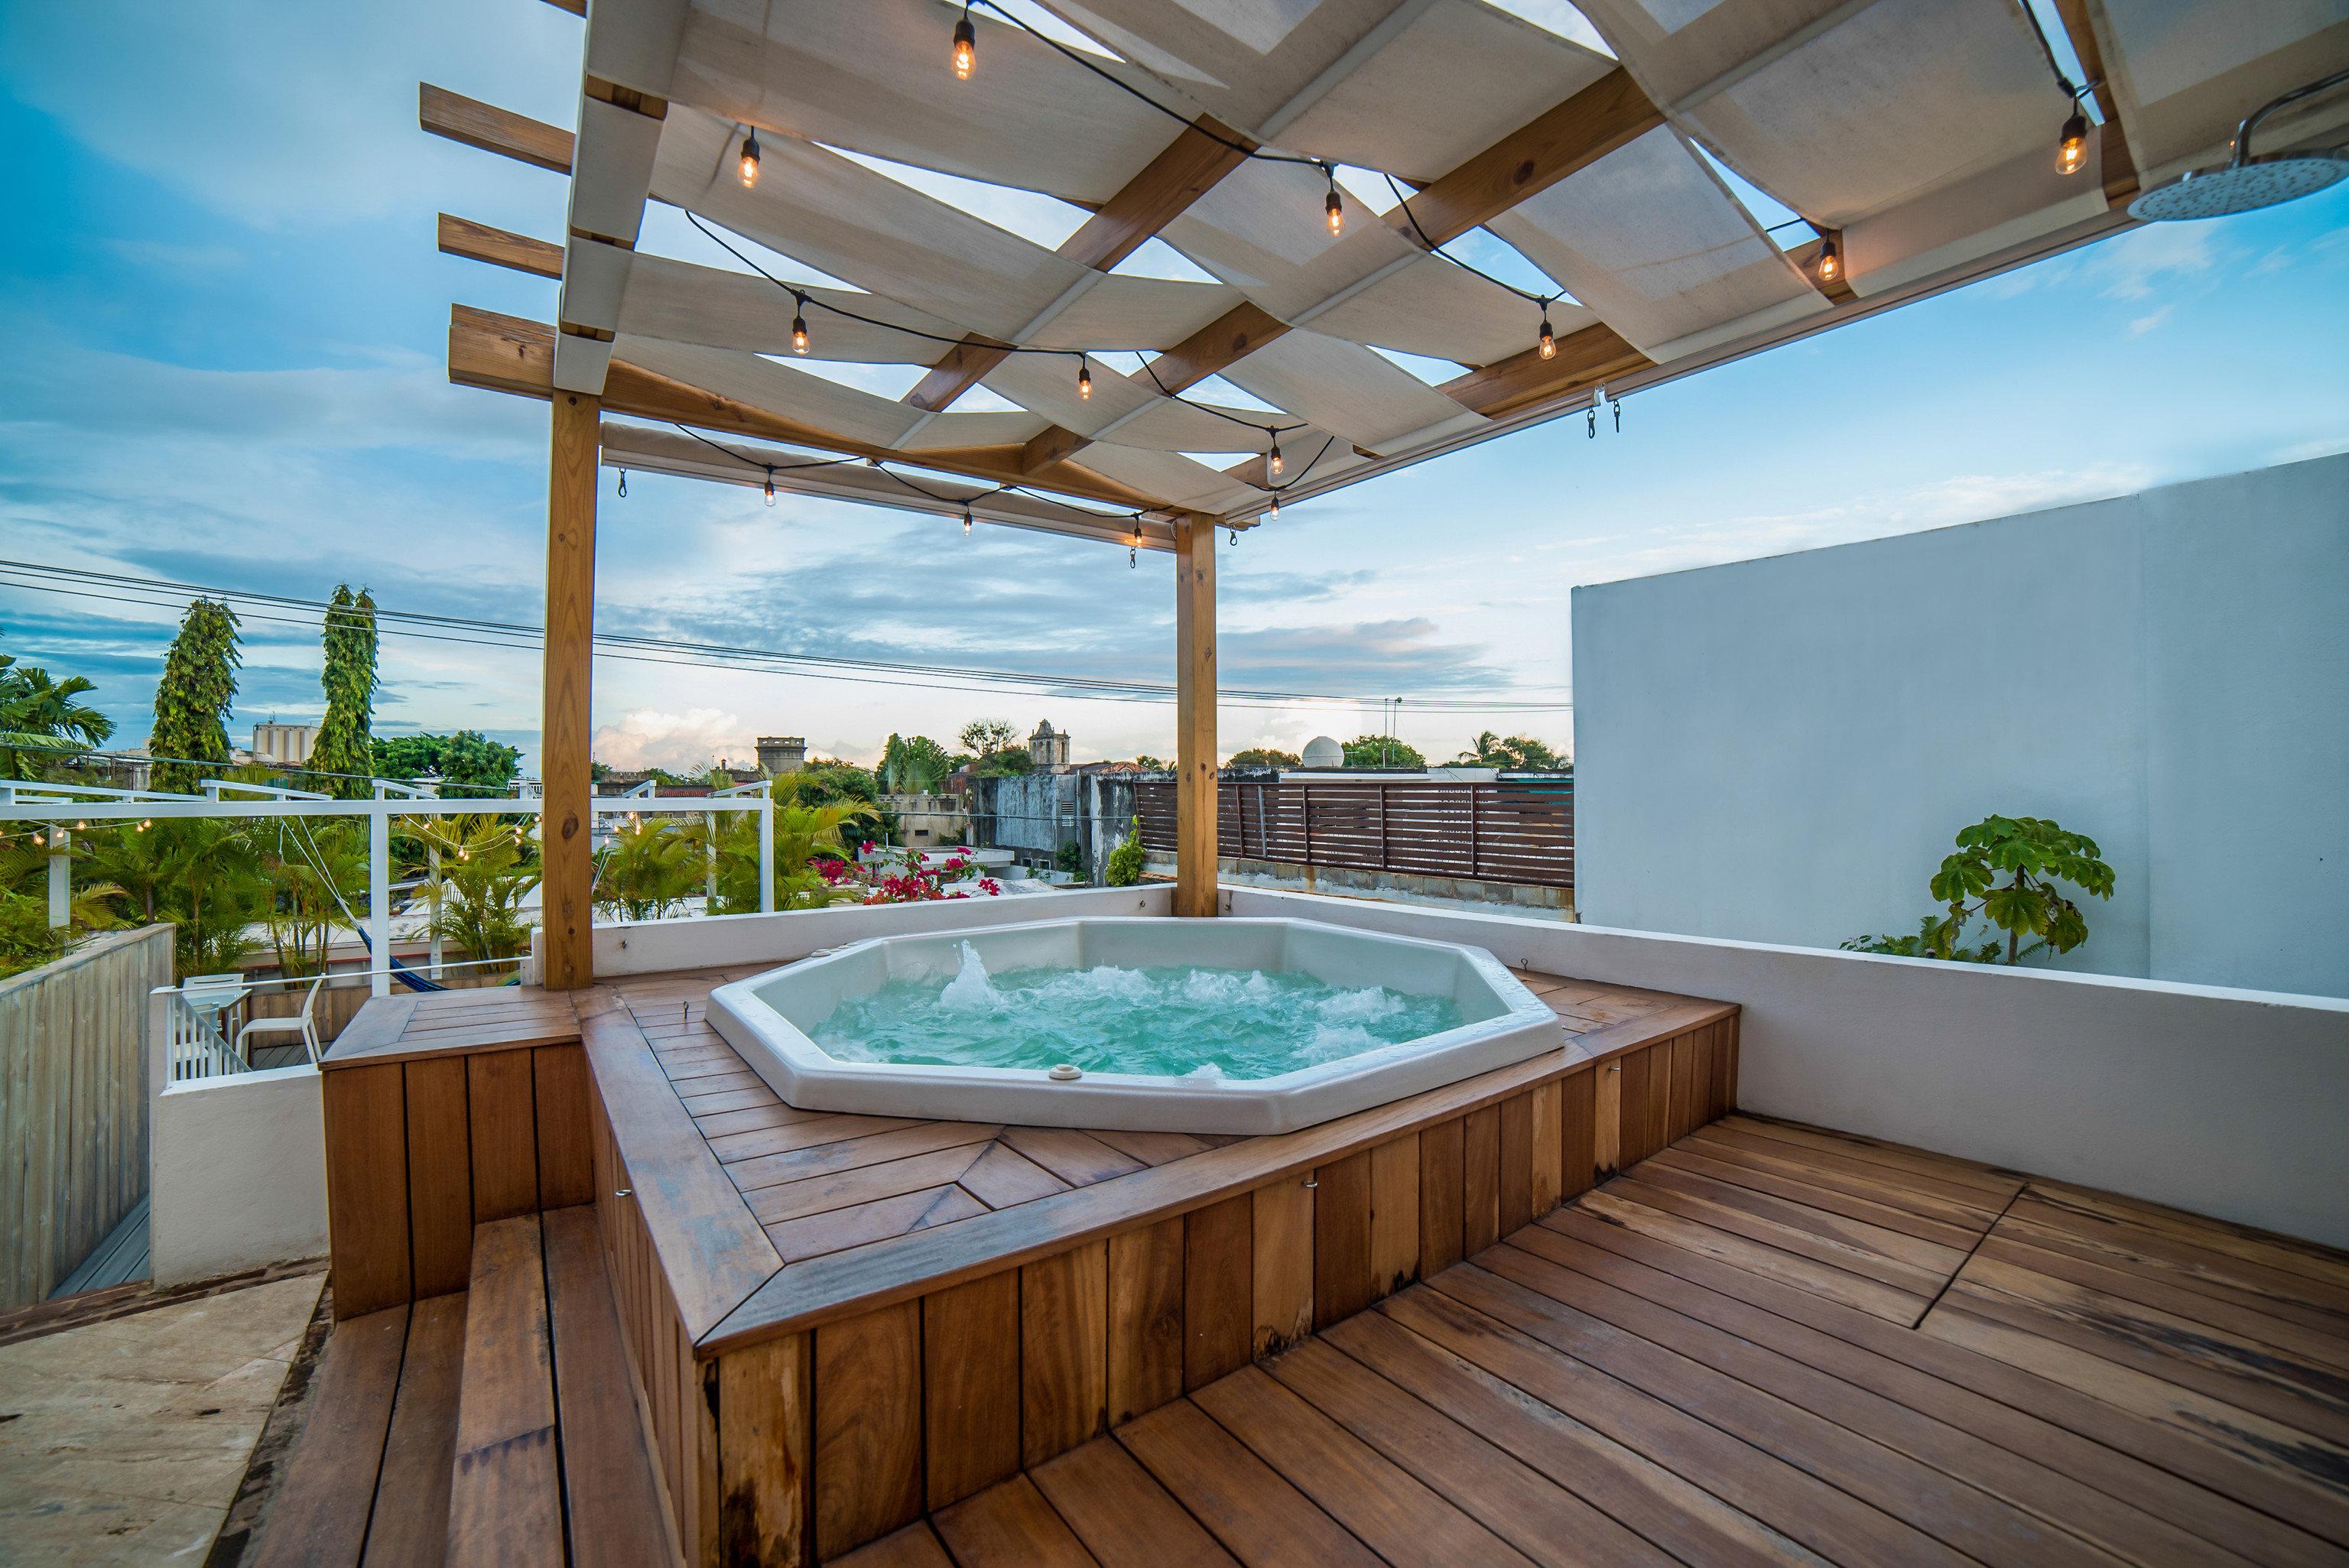 Hotels floor indoor swimming pool property building ceiling room estate real estate Resort Villa interior design backyard Deck wood